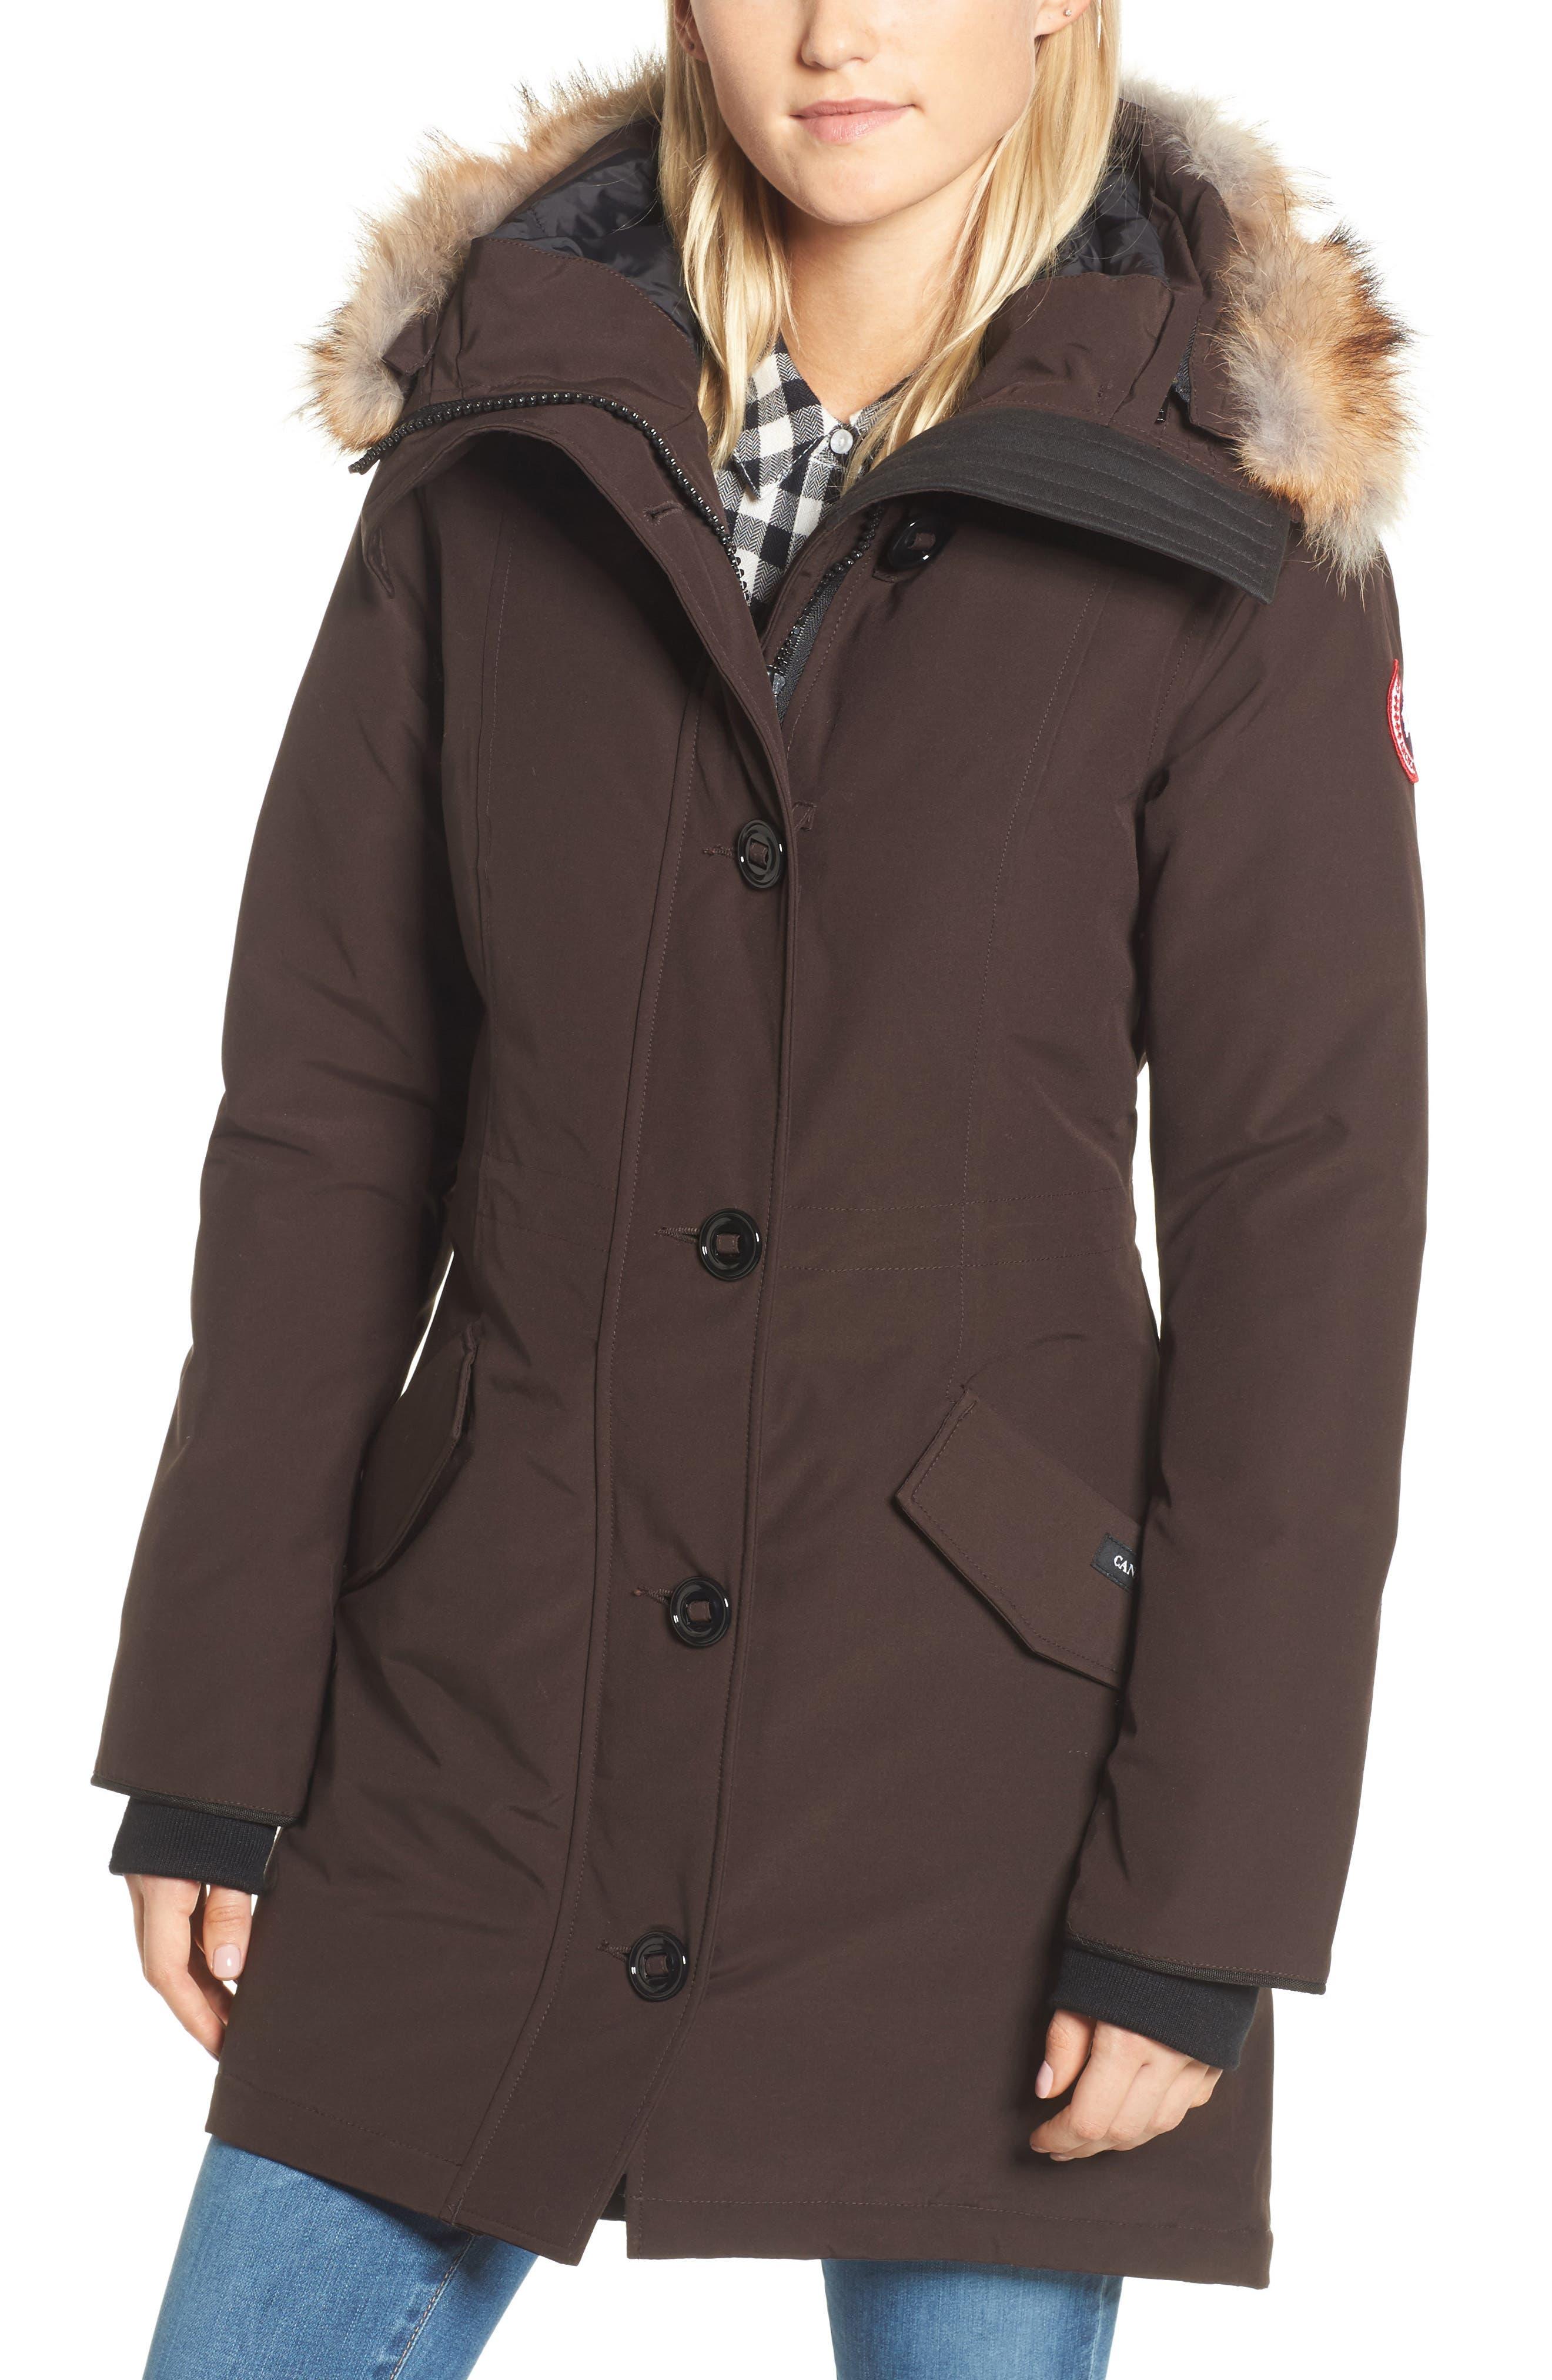 Women's real fur trim jacket